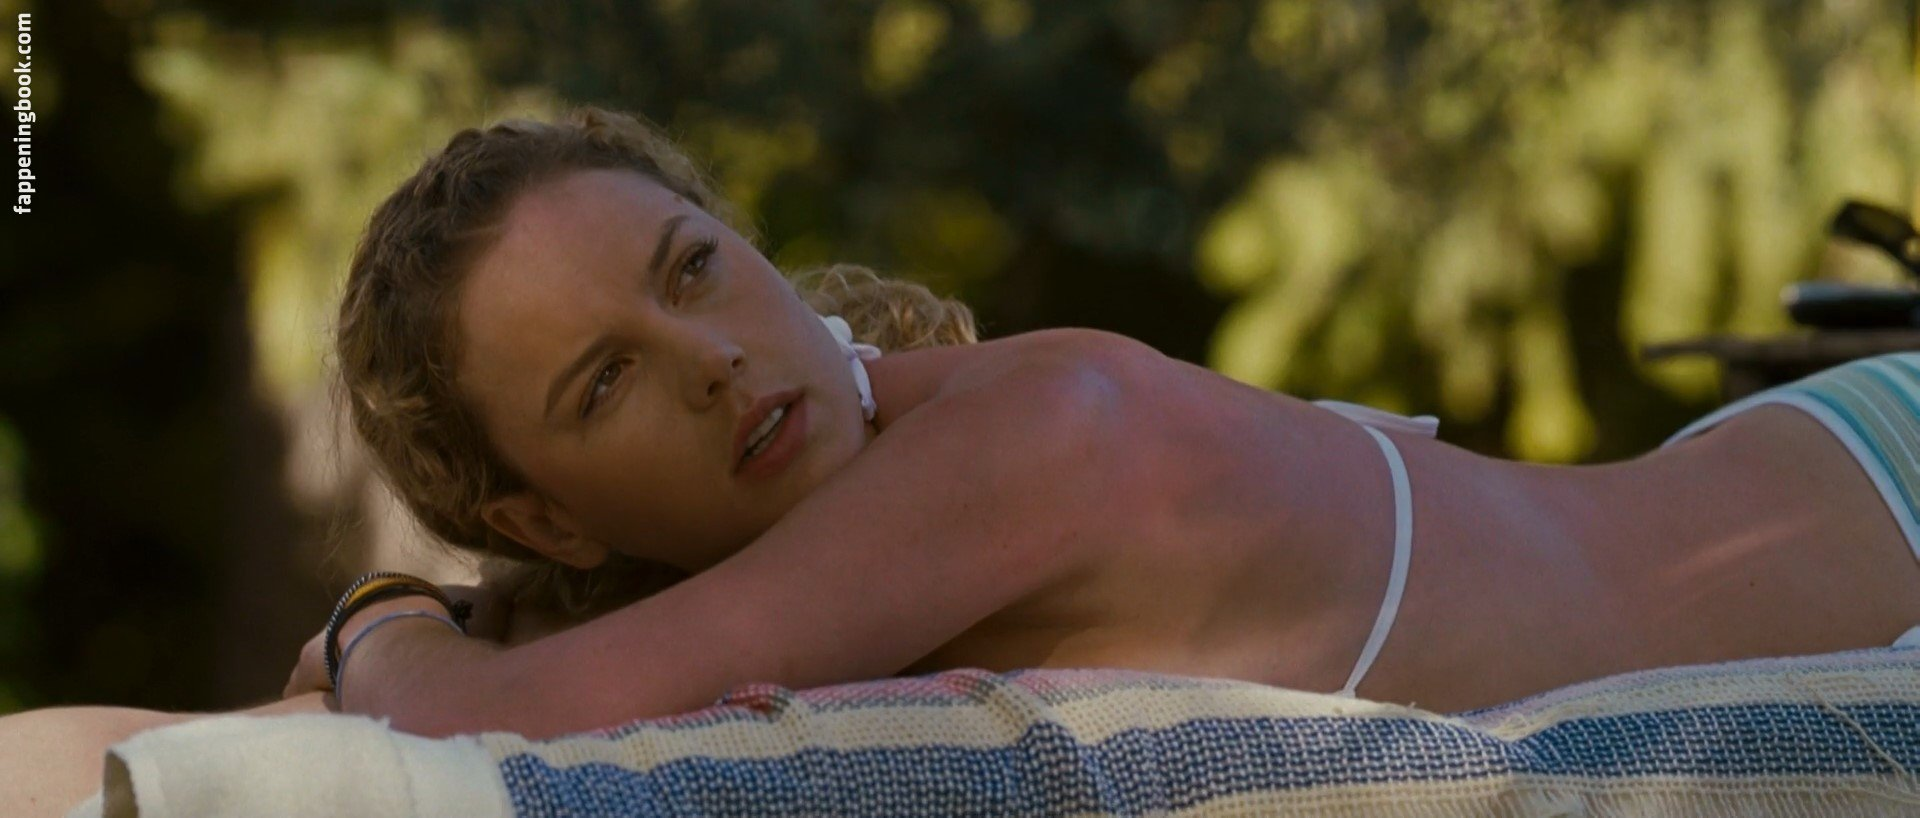 Angelica Chain Nude abbie cornish nude, sexy, the fappening, uncensored - photo